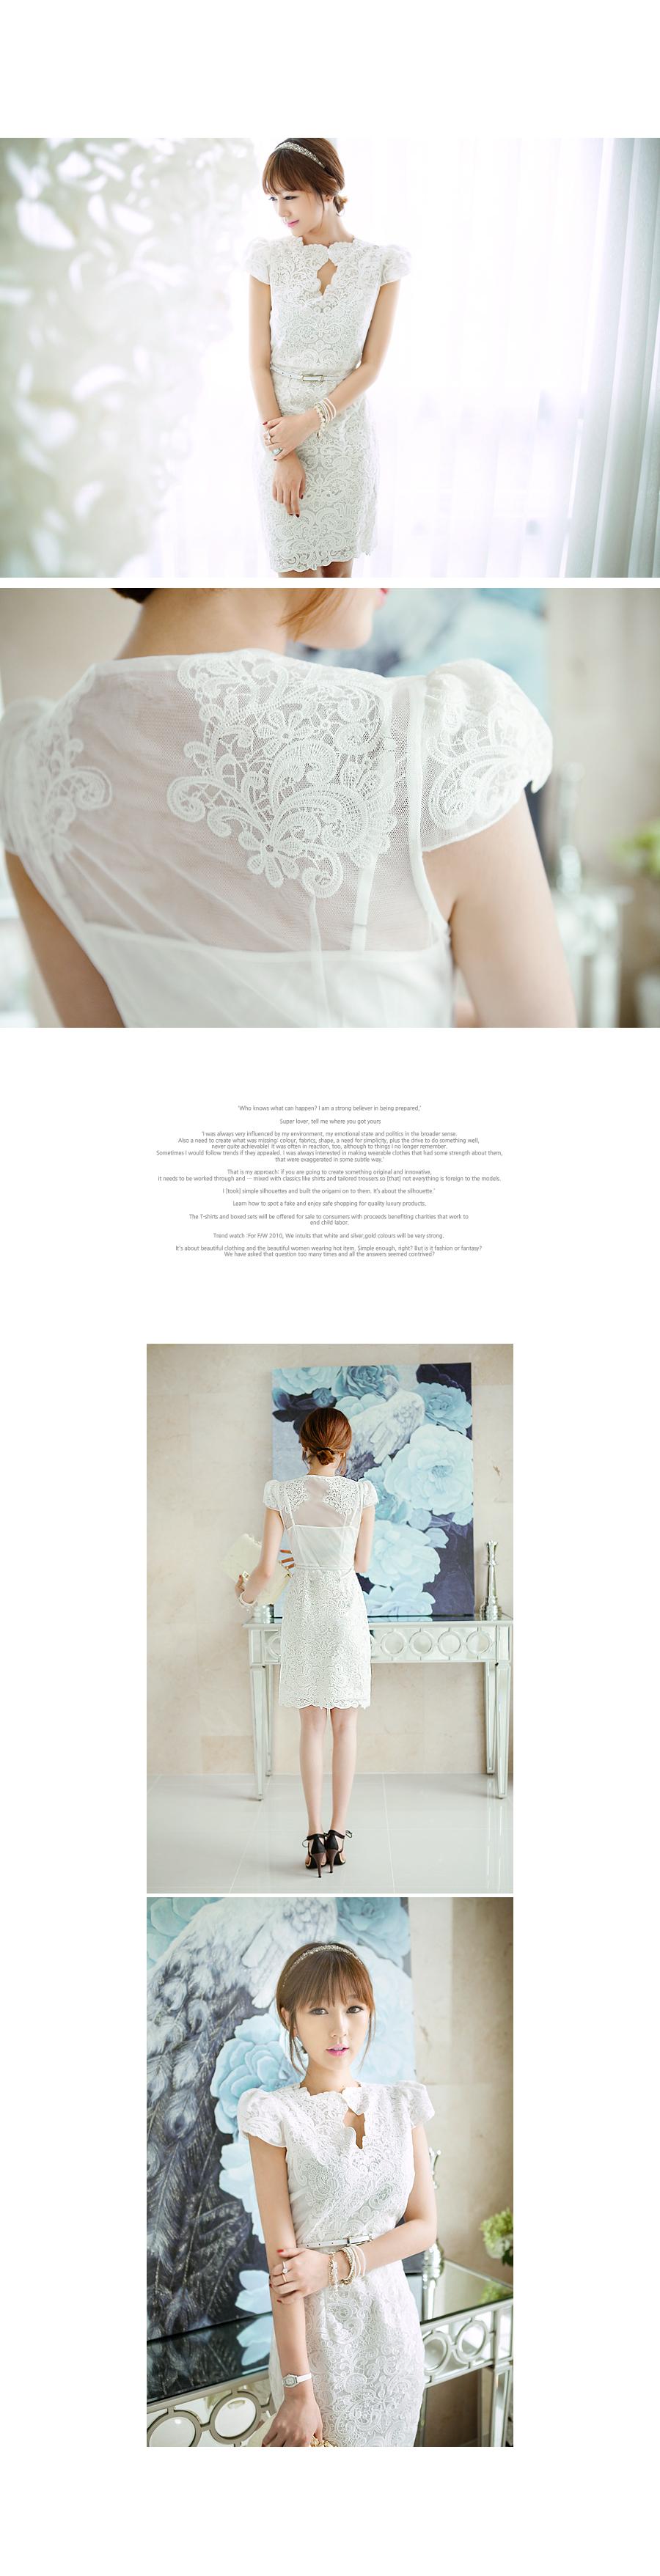 Mesh-Back Lace Sheath Dress - TISVIN | YESSTYLE